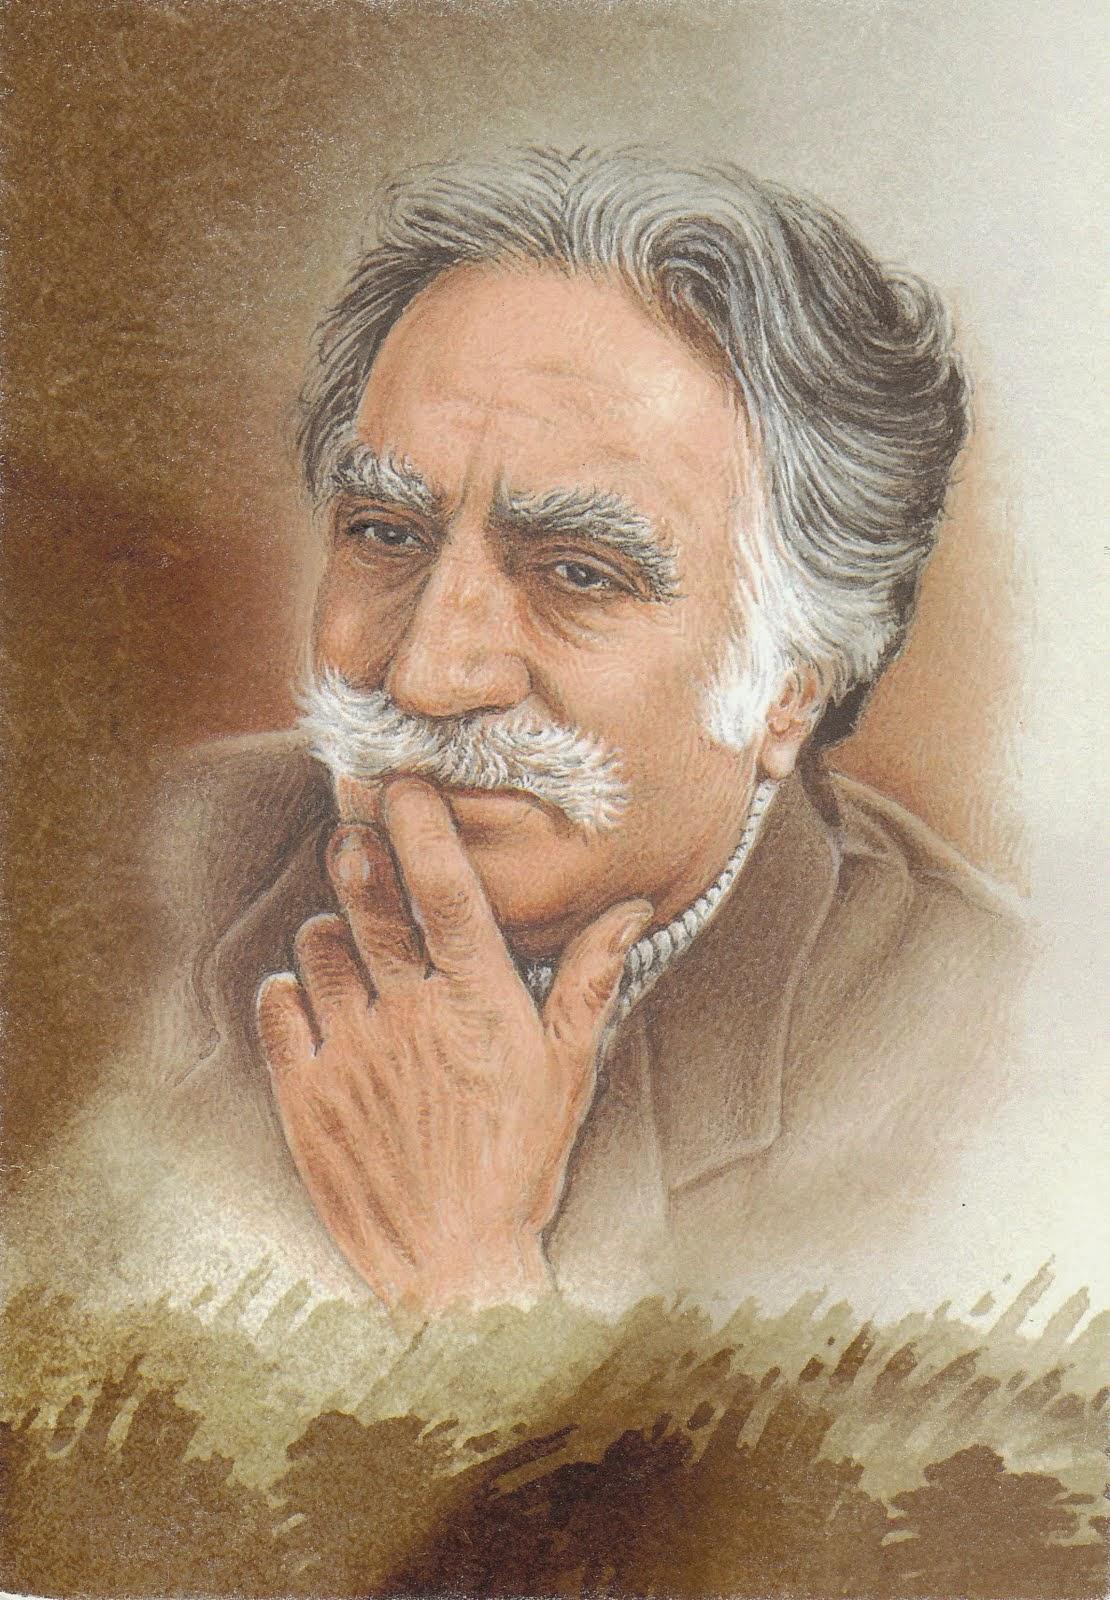 art now and then mahmoud farshchian mahmoud farshchian self portrait